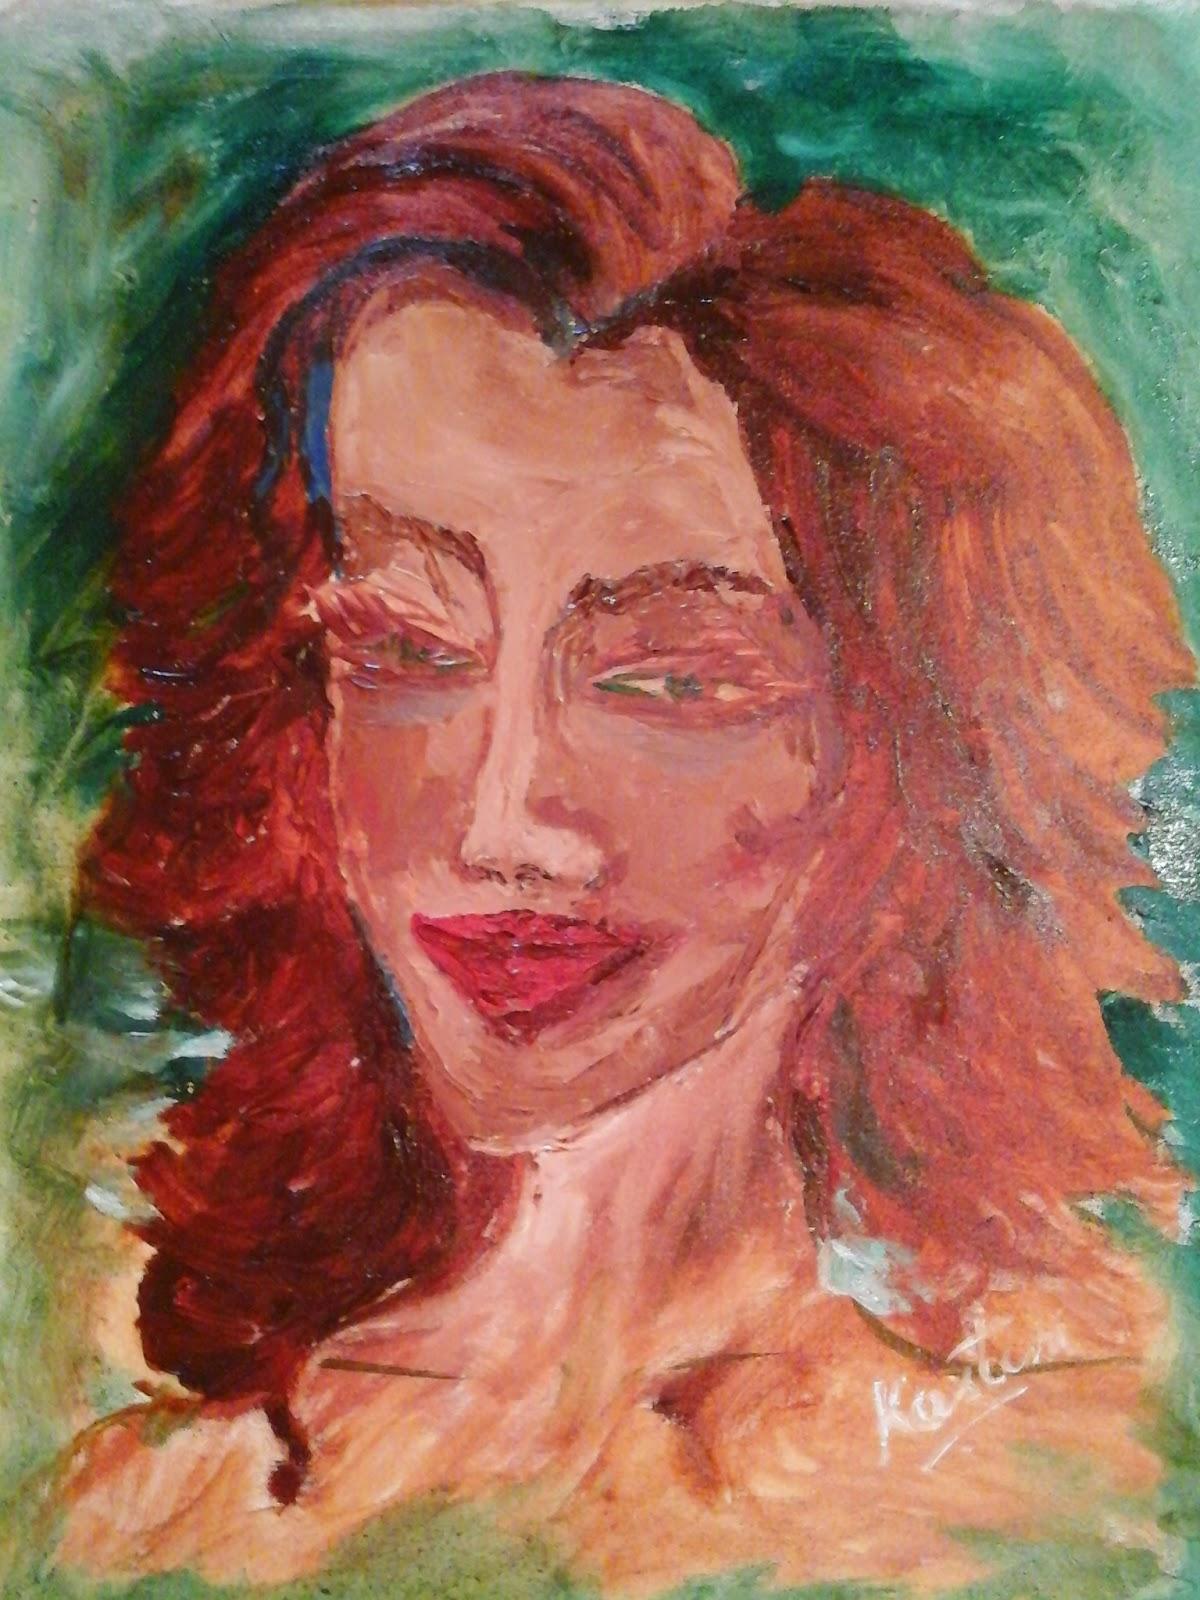 Art By Kasturi Borkotoki August 2014 Oil On Canvas With Palette Knives